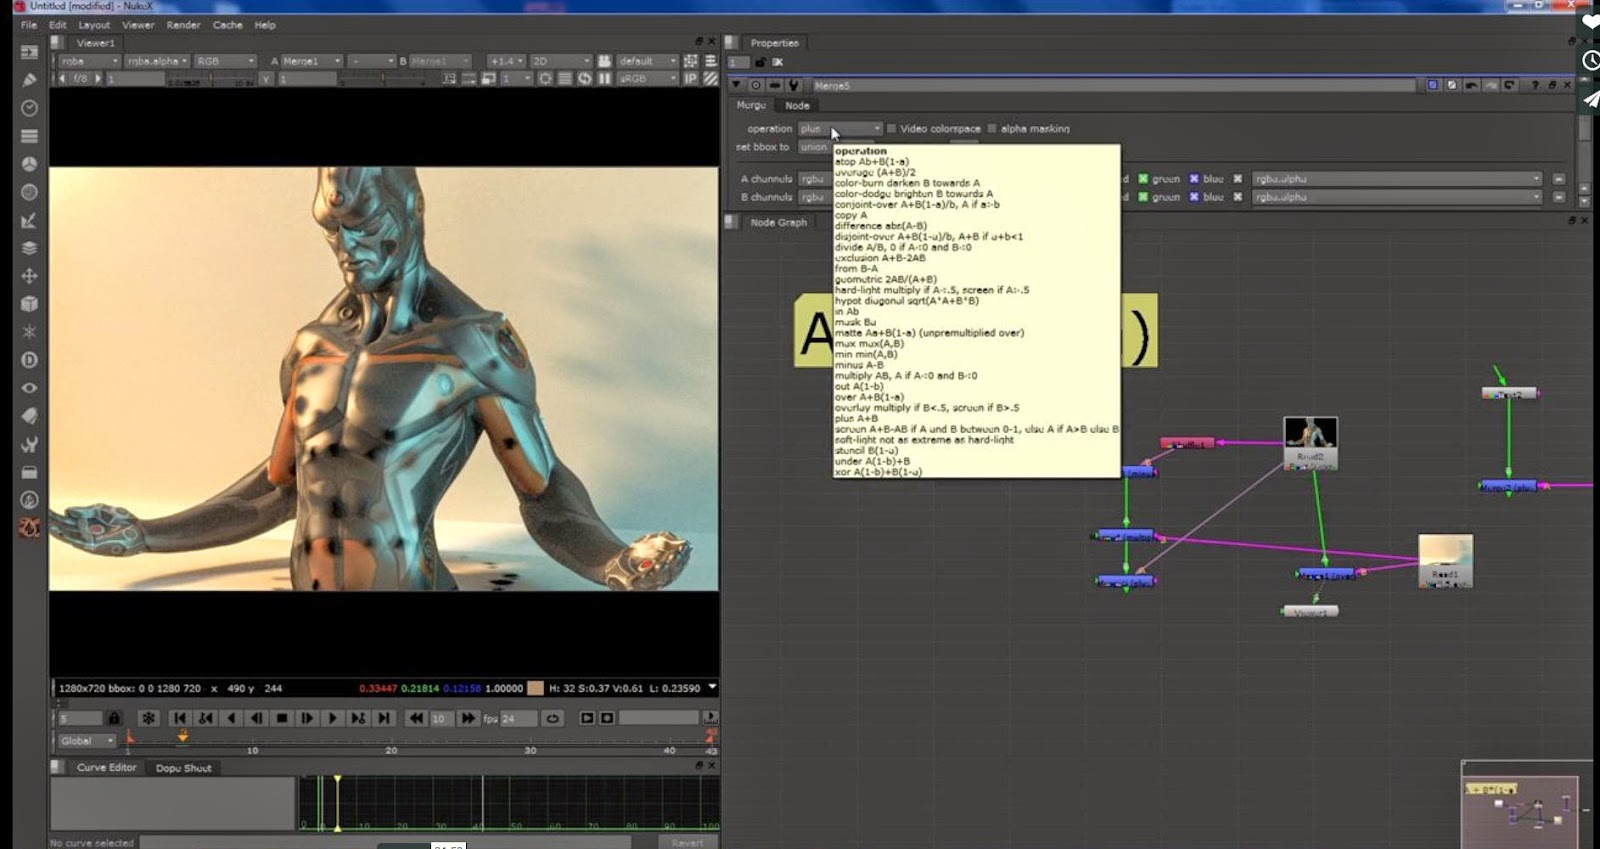 Nuke compositing tutorials pdf